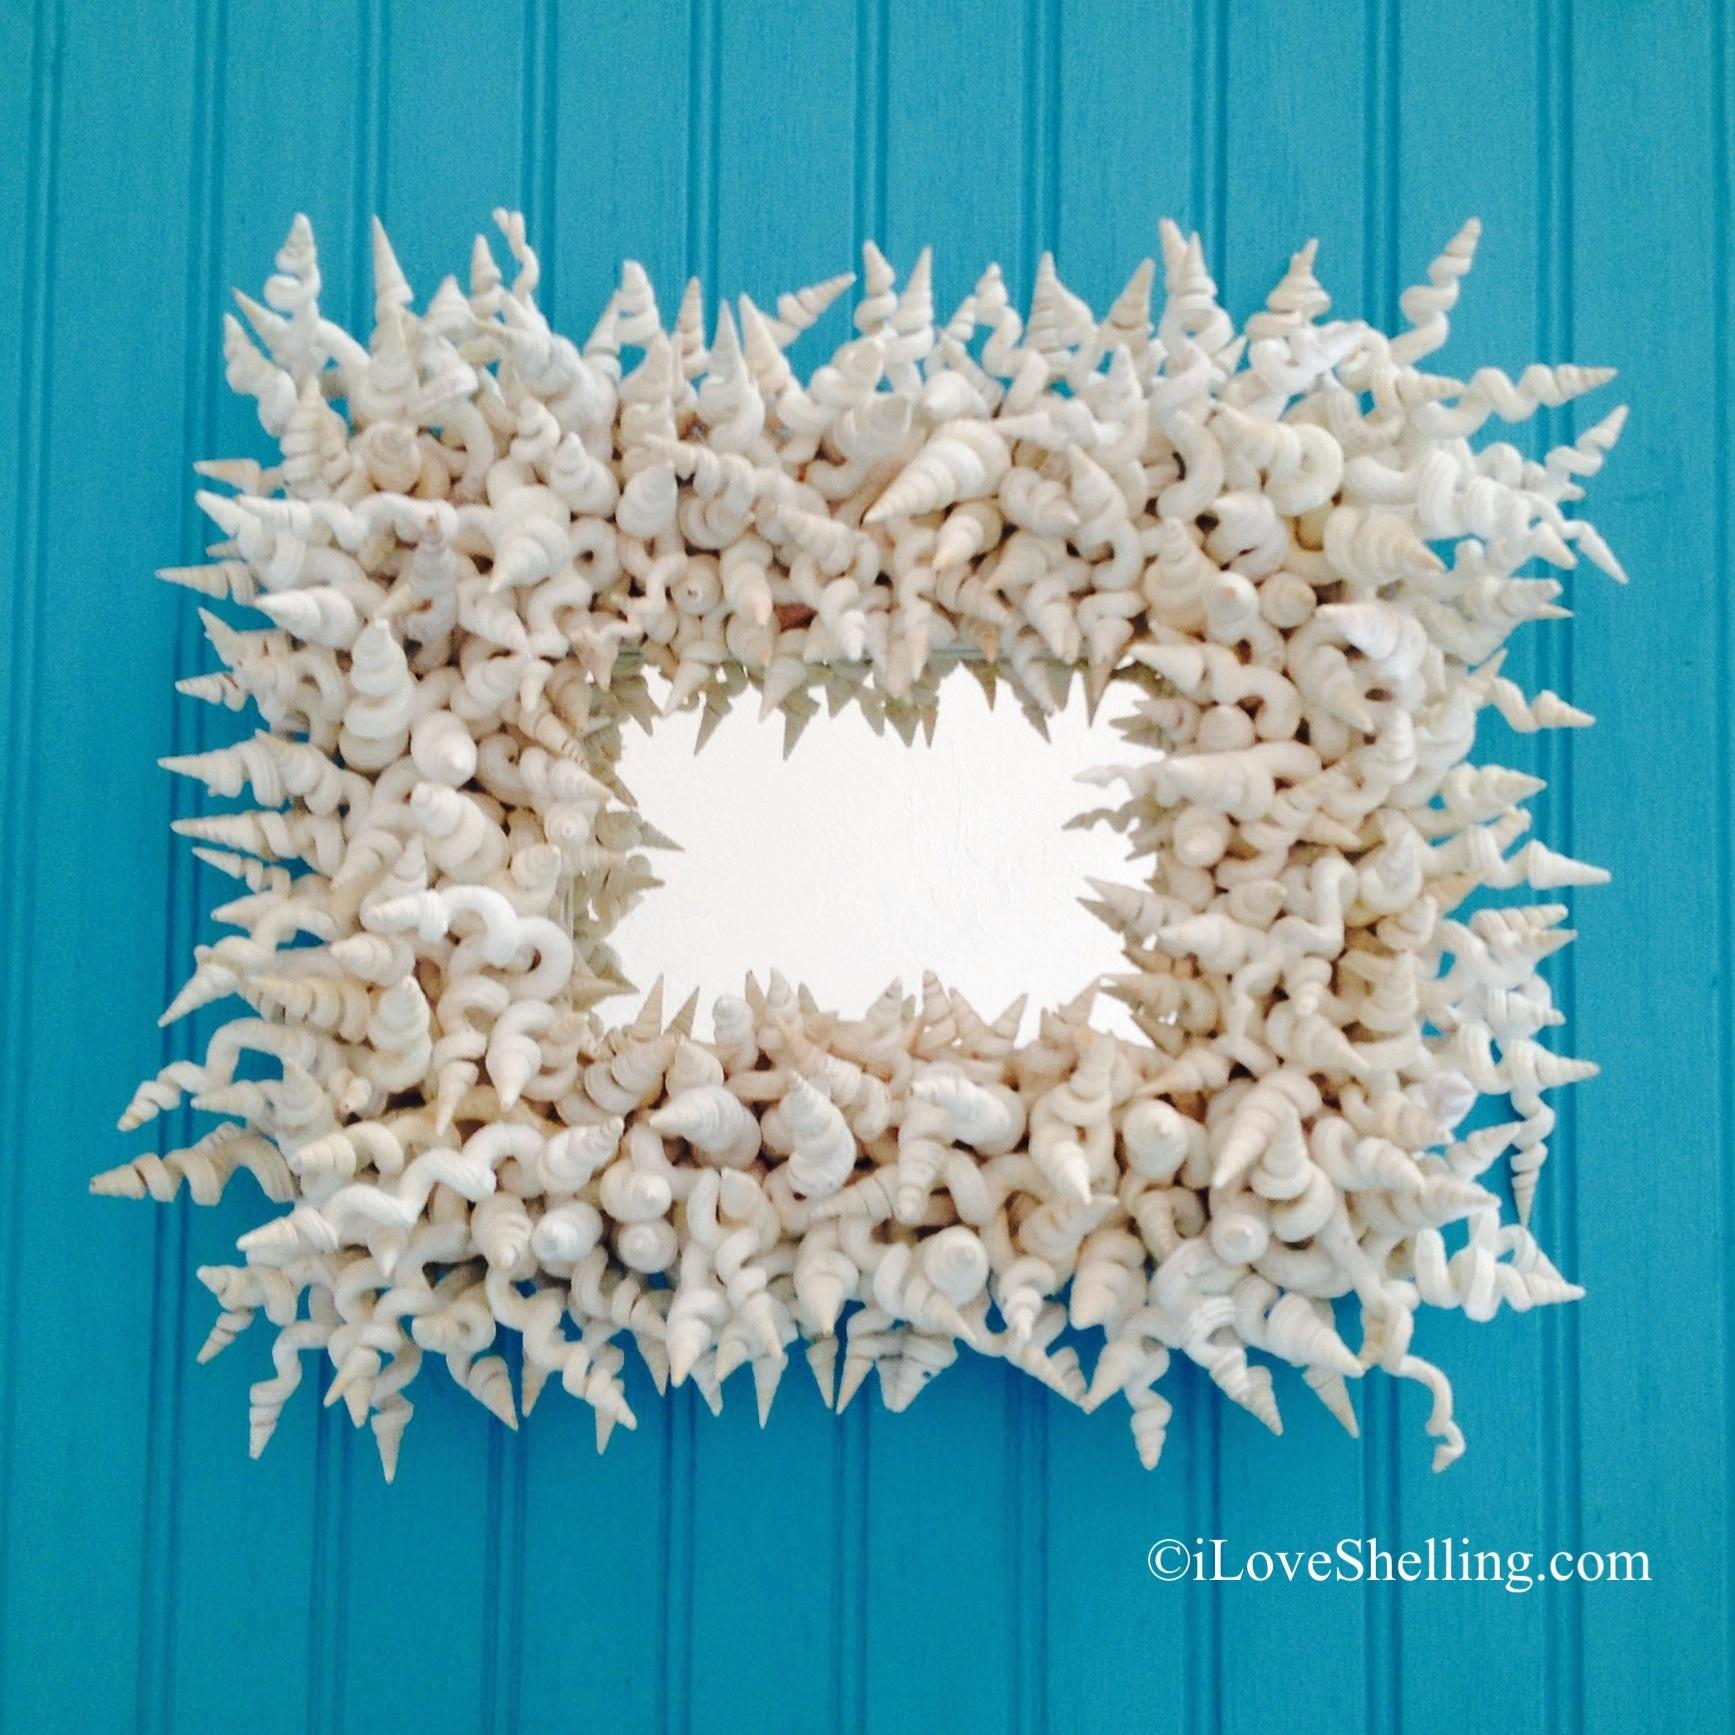 Whimsical World Of Worm Shells